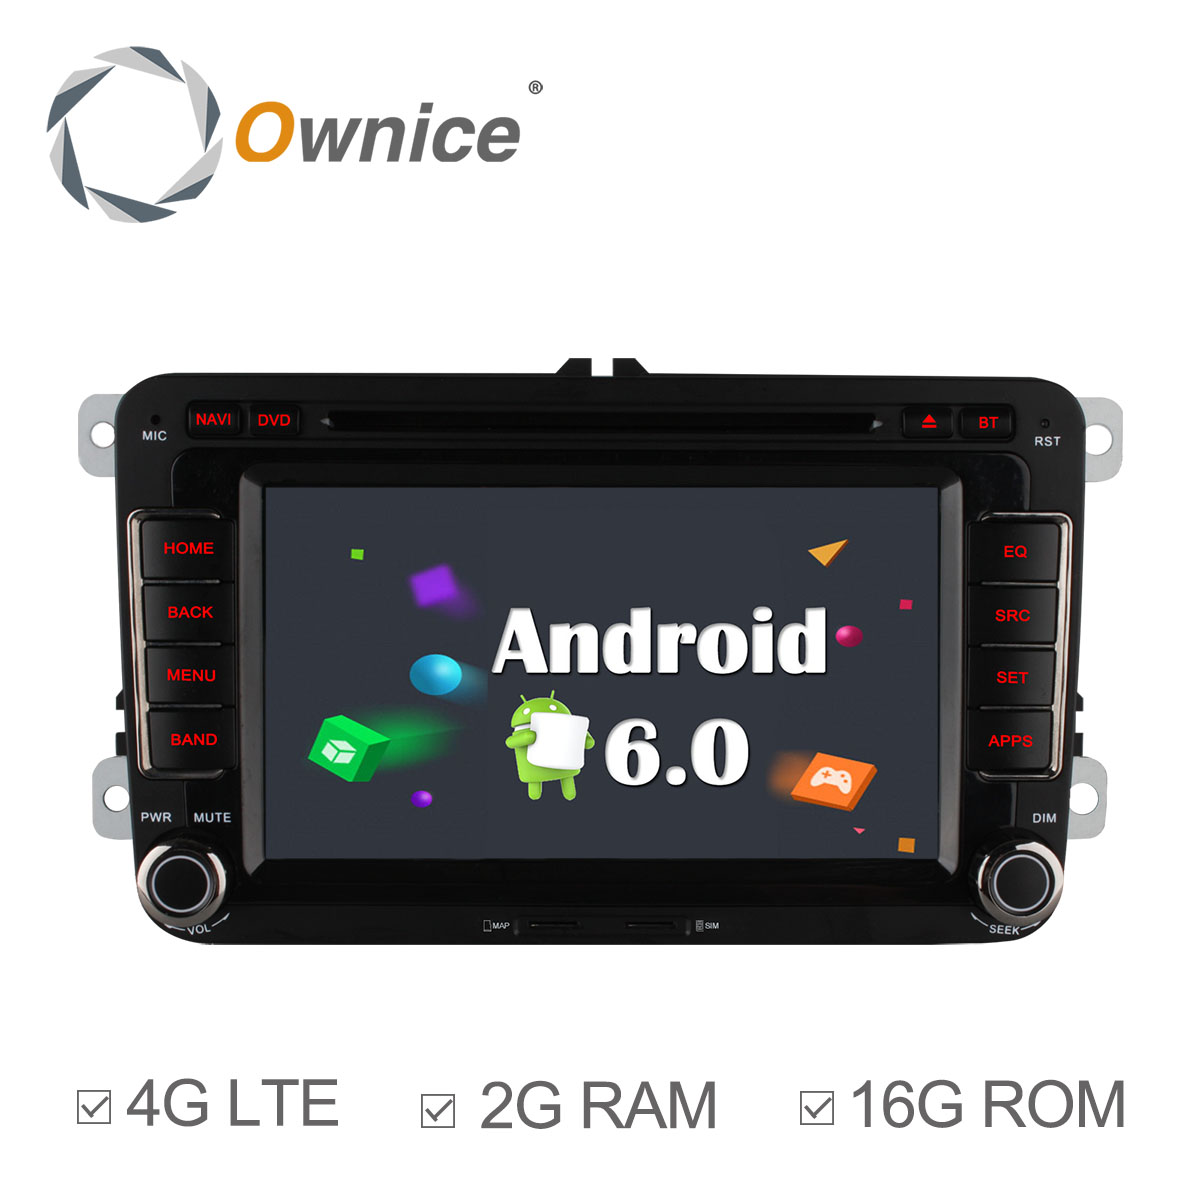 Ownice Android 6.0 Quad Core 2G RAM Car DVD GPS navi player for Volkswagen golf 4 golf 5 6 touran passat B6 sharan jetta caddy(China (Mainland))